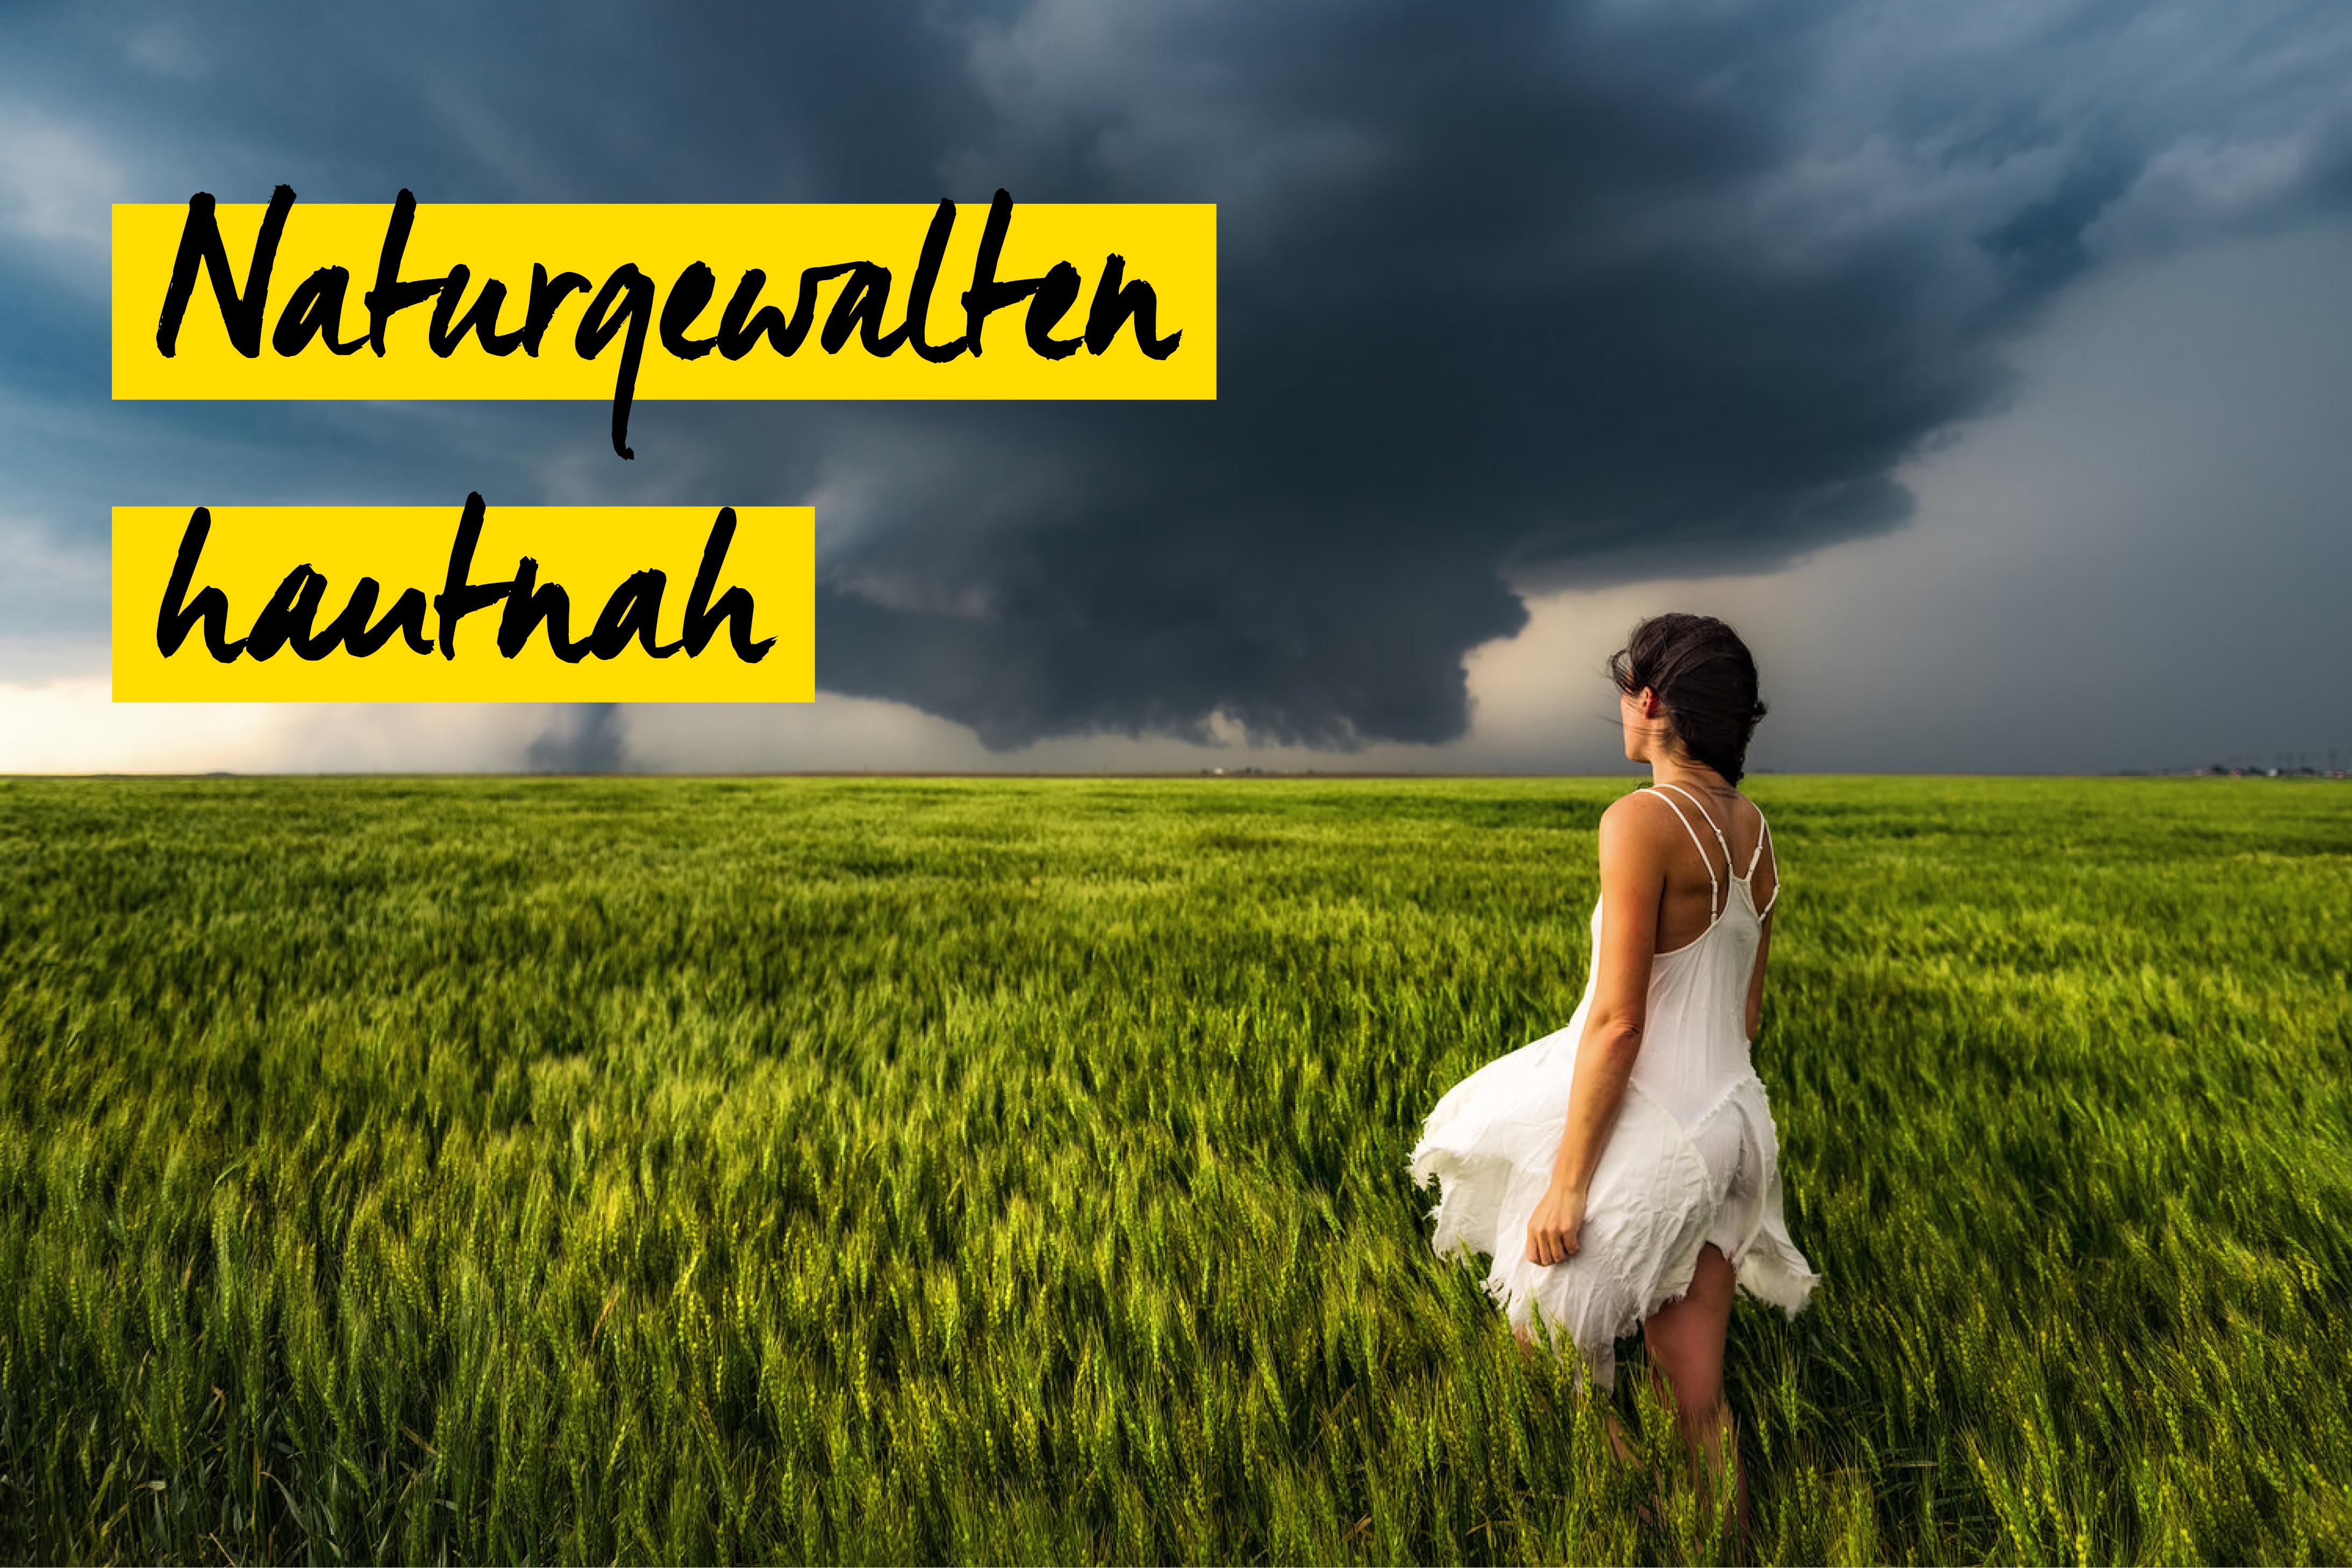 Sturm mit Frau auf Feld